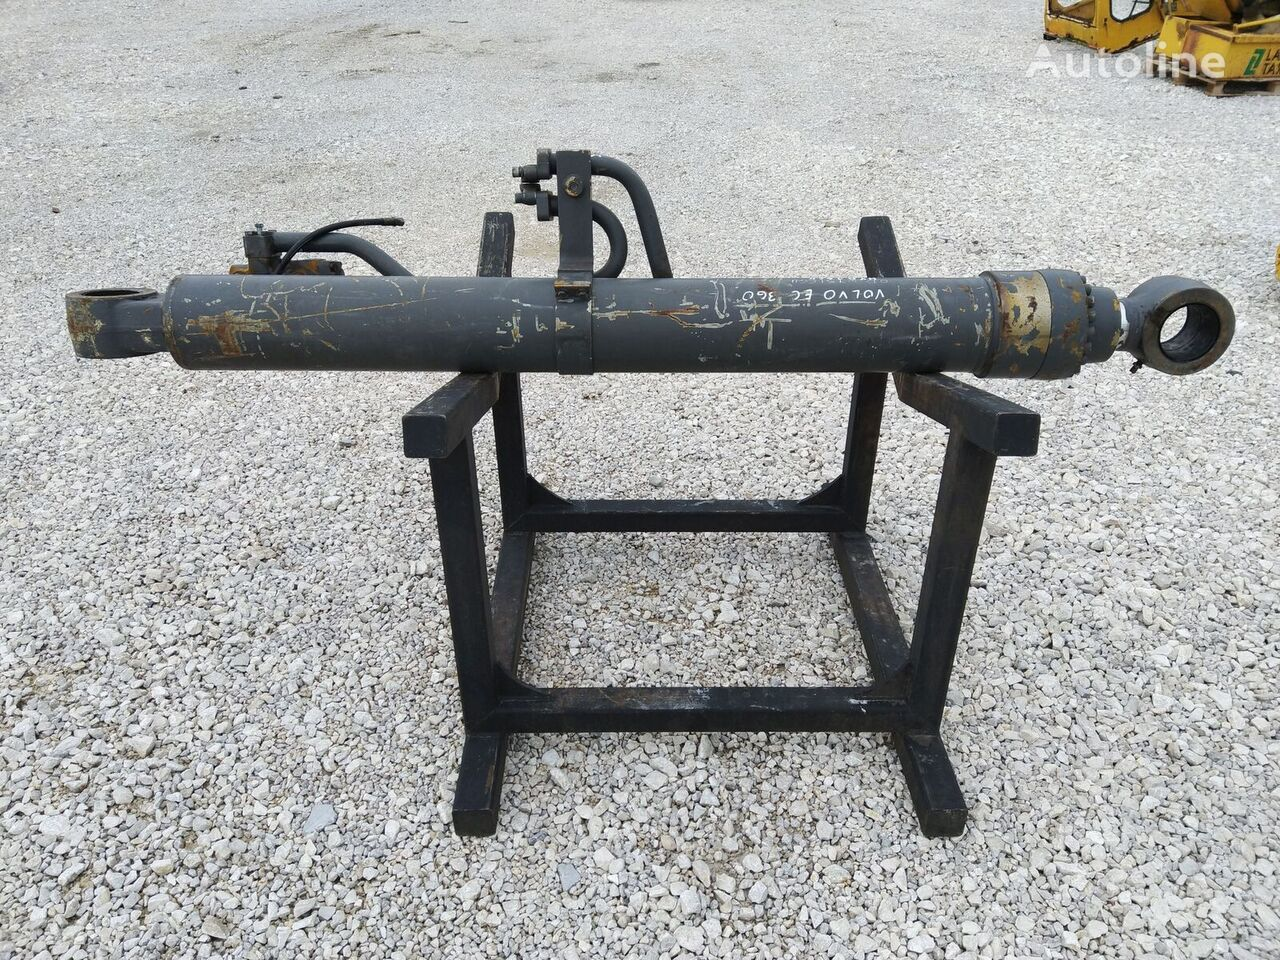 Stellantrieb Parts Teile hydraulic cylinder for VOLVO EC 360 290 300 340 380 390 460 [D-216 S-110 S-100 T-105]  excavator